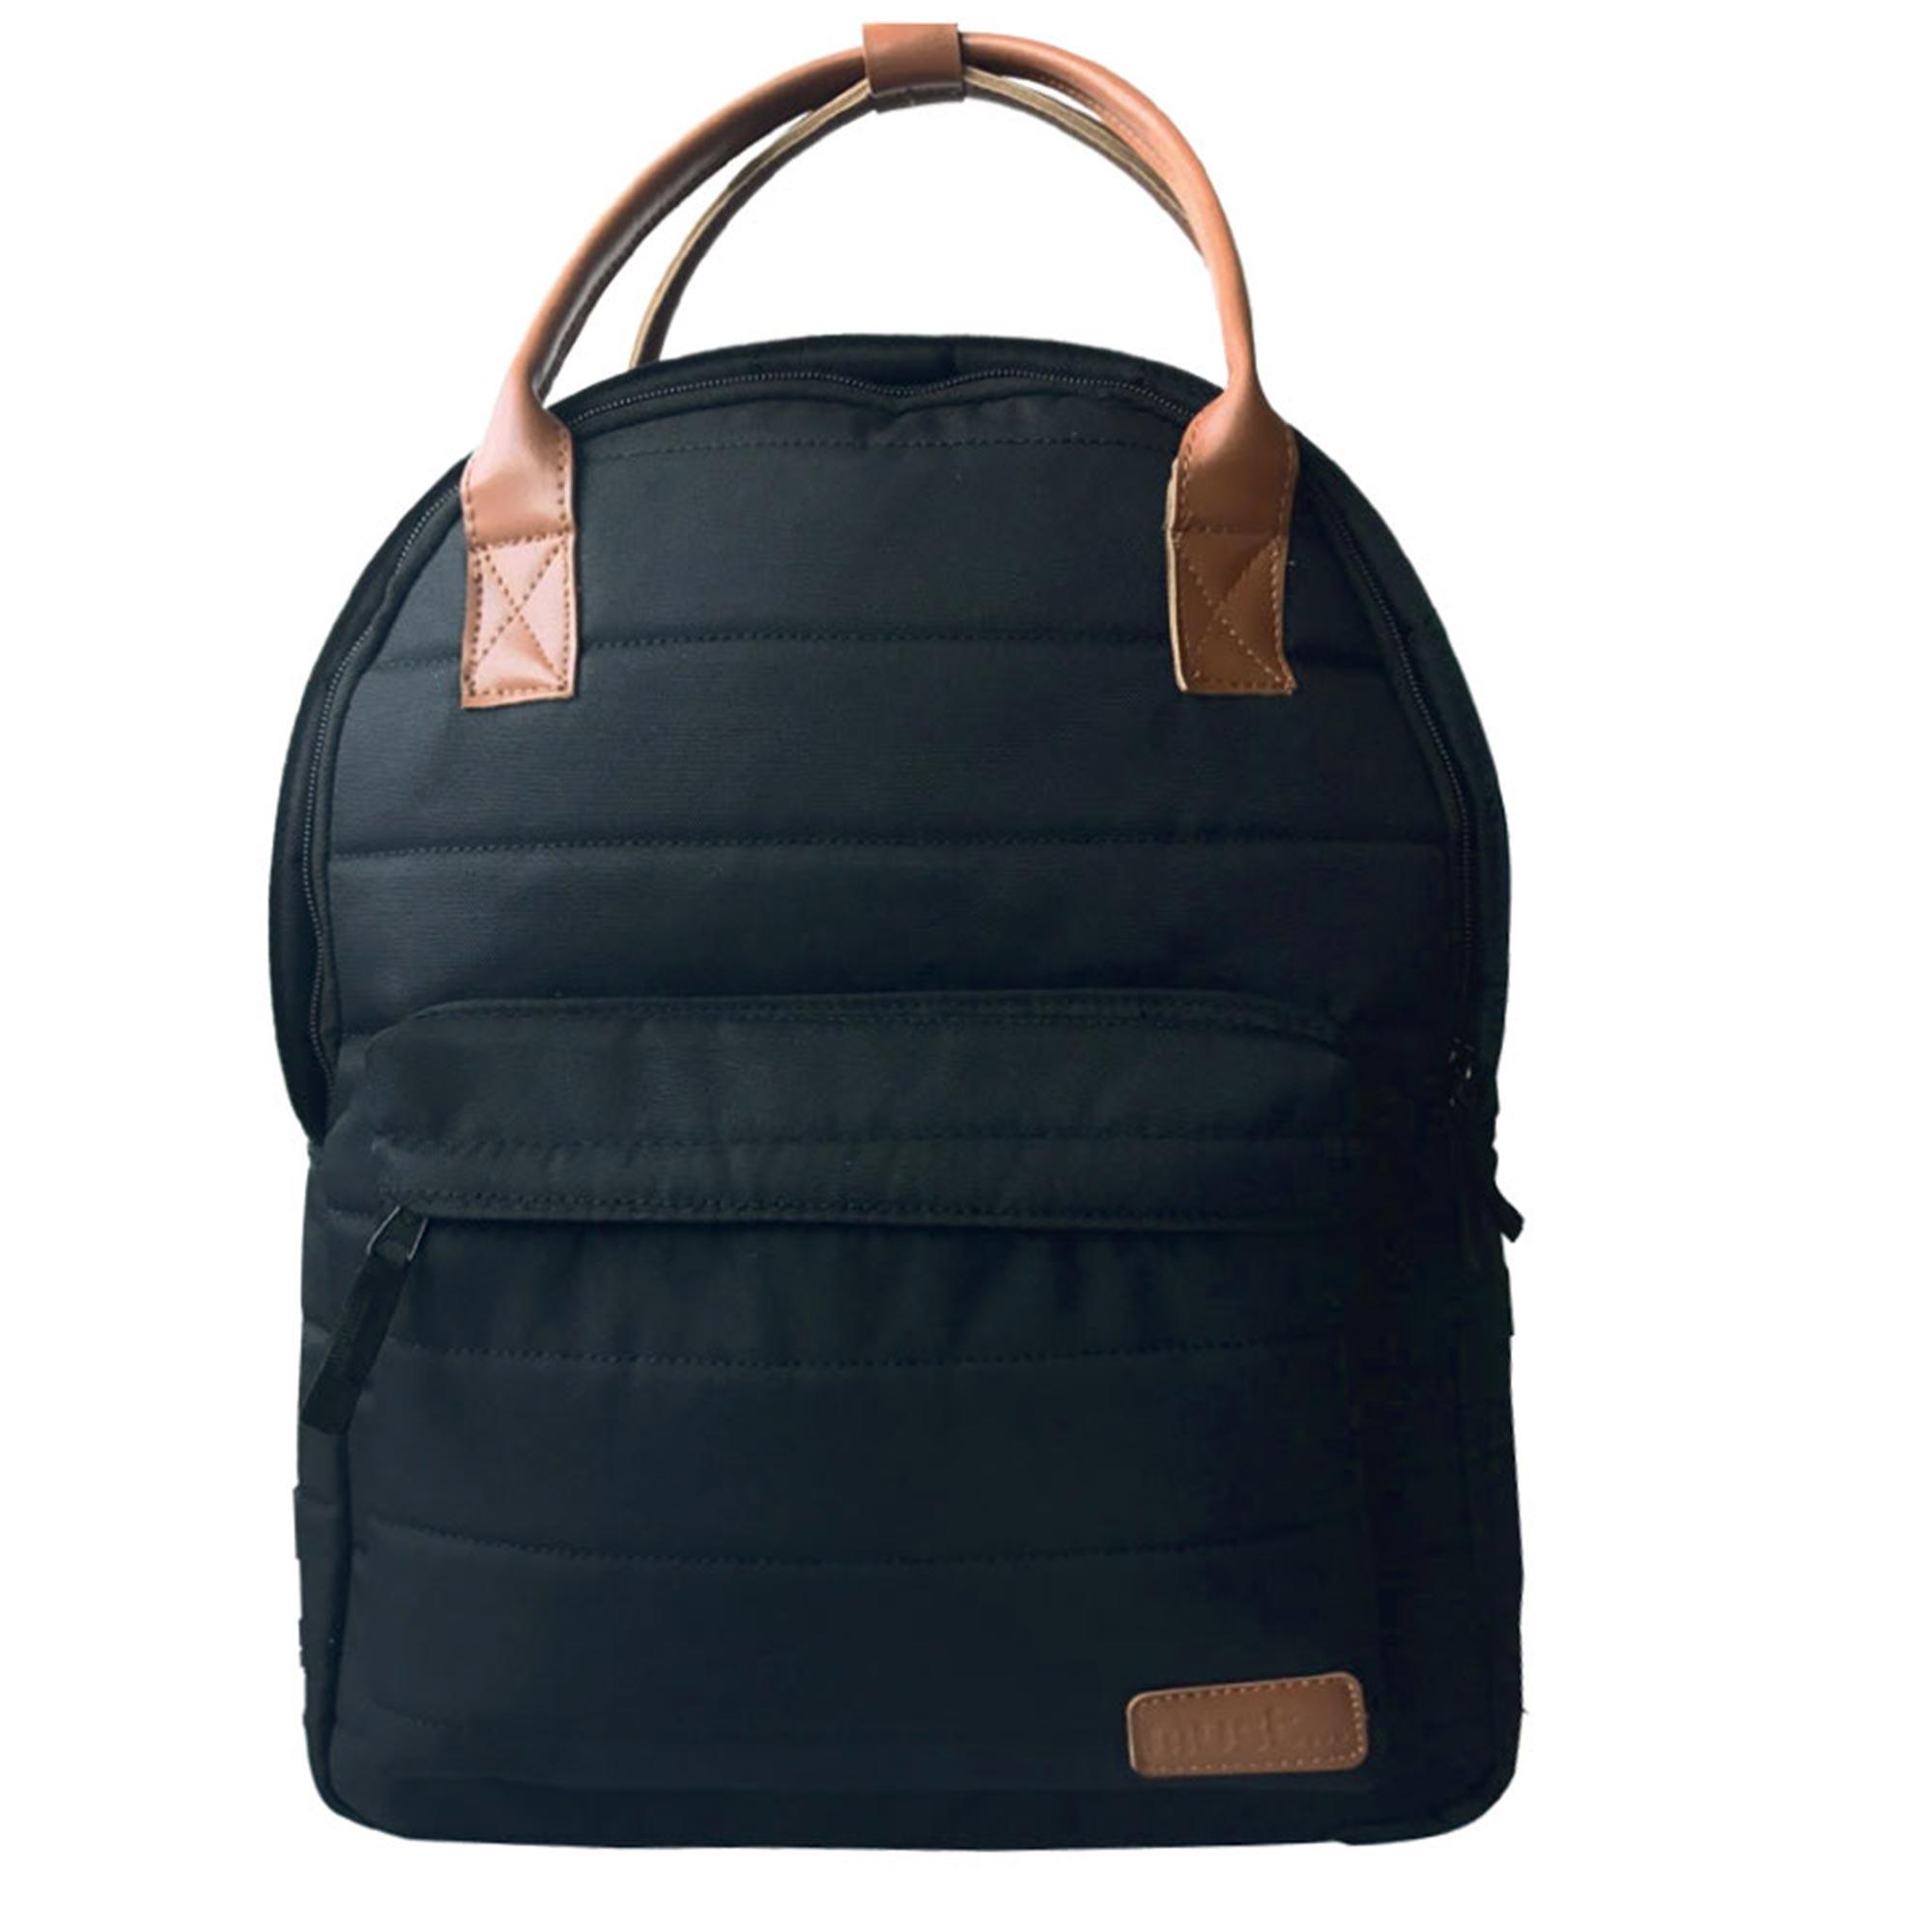 Prestige Black Backpack - Must BackPacks 554c75b4c54